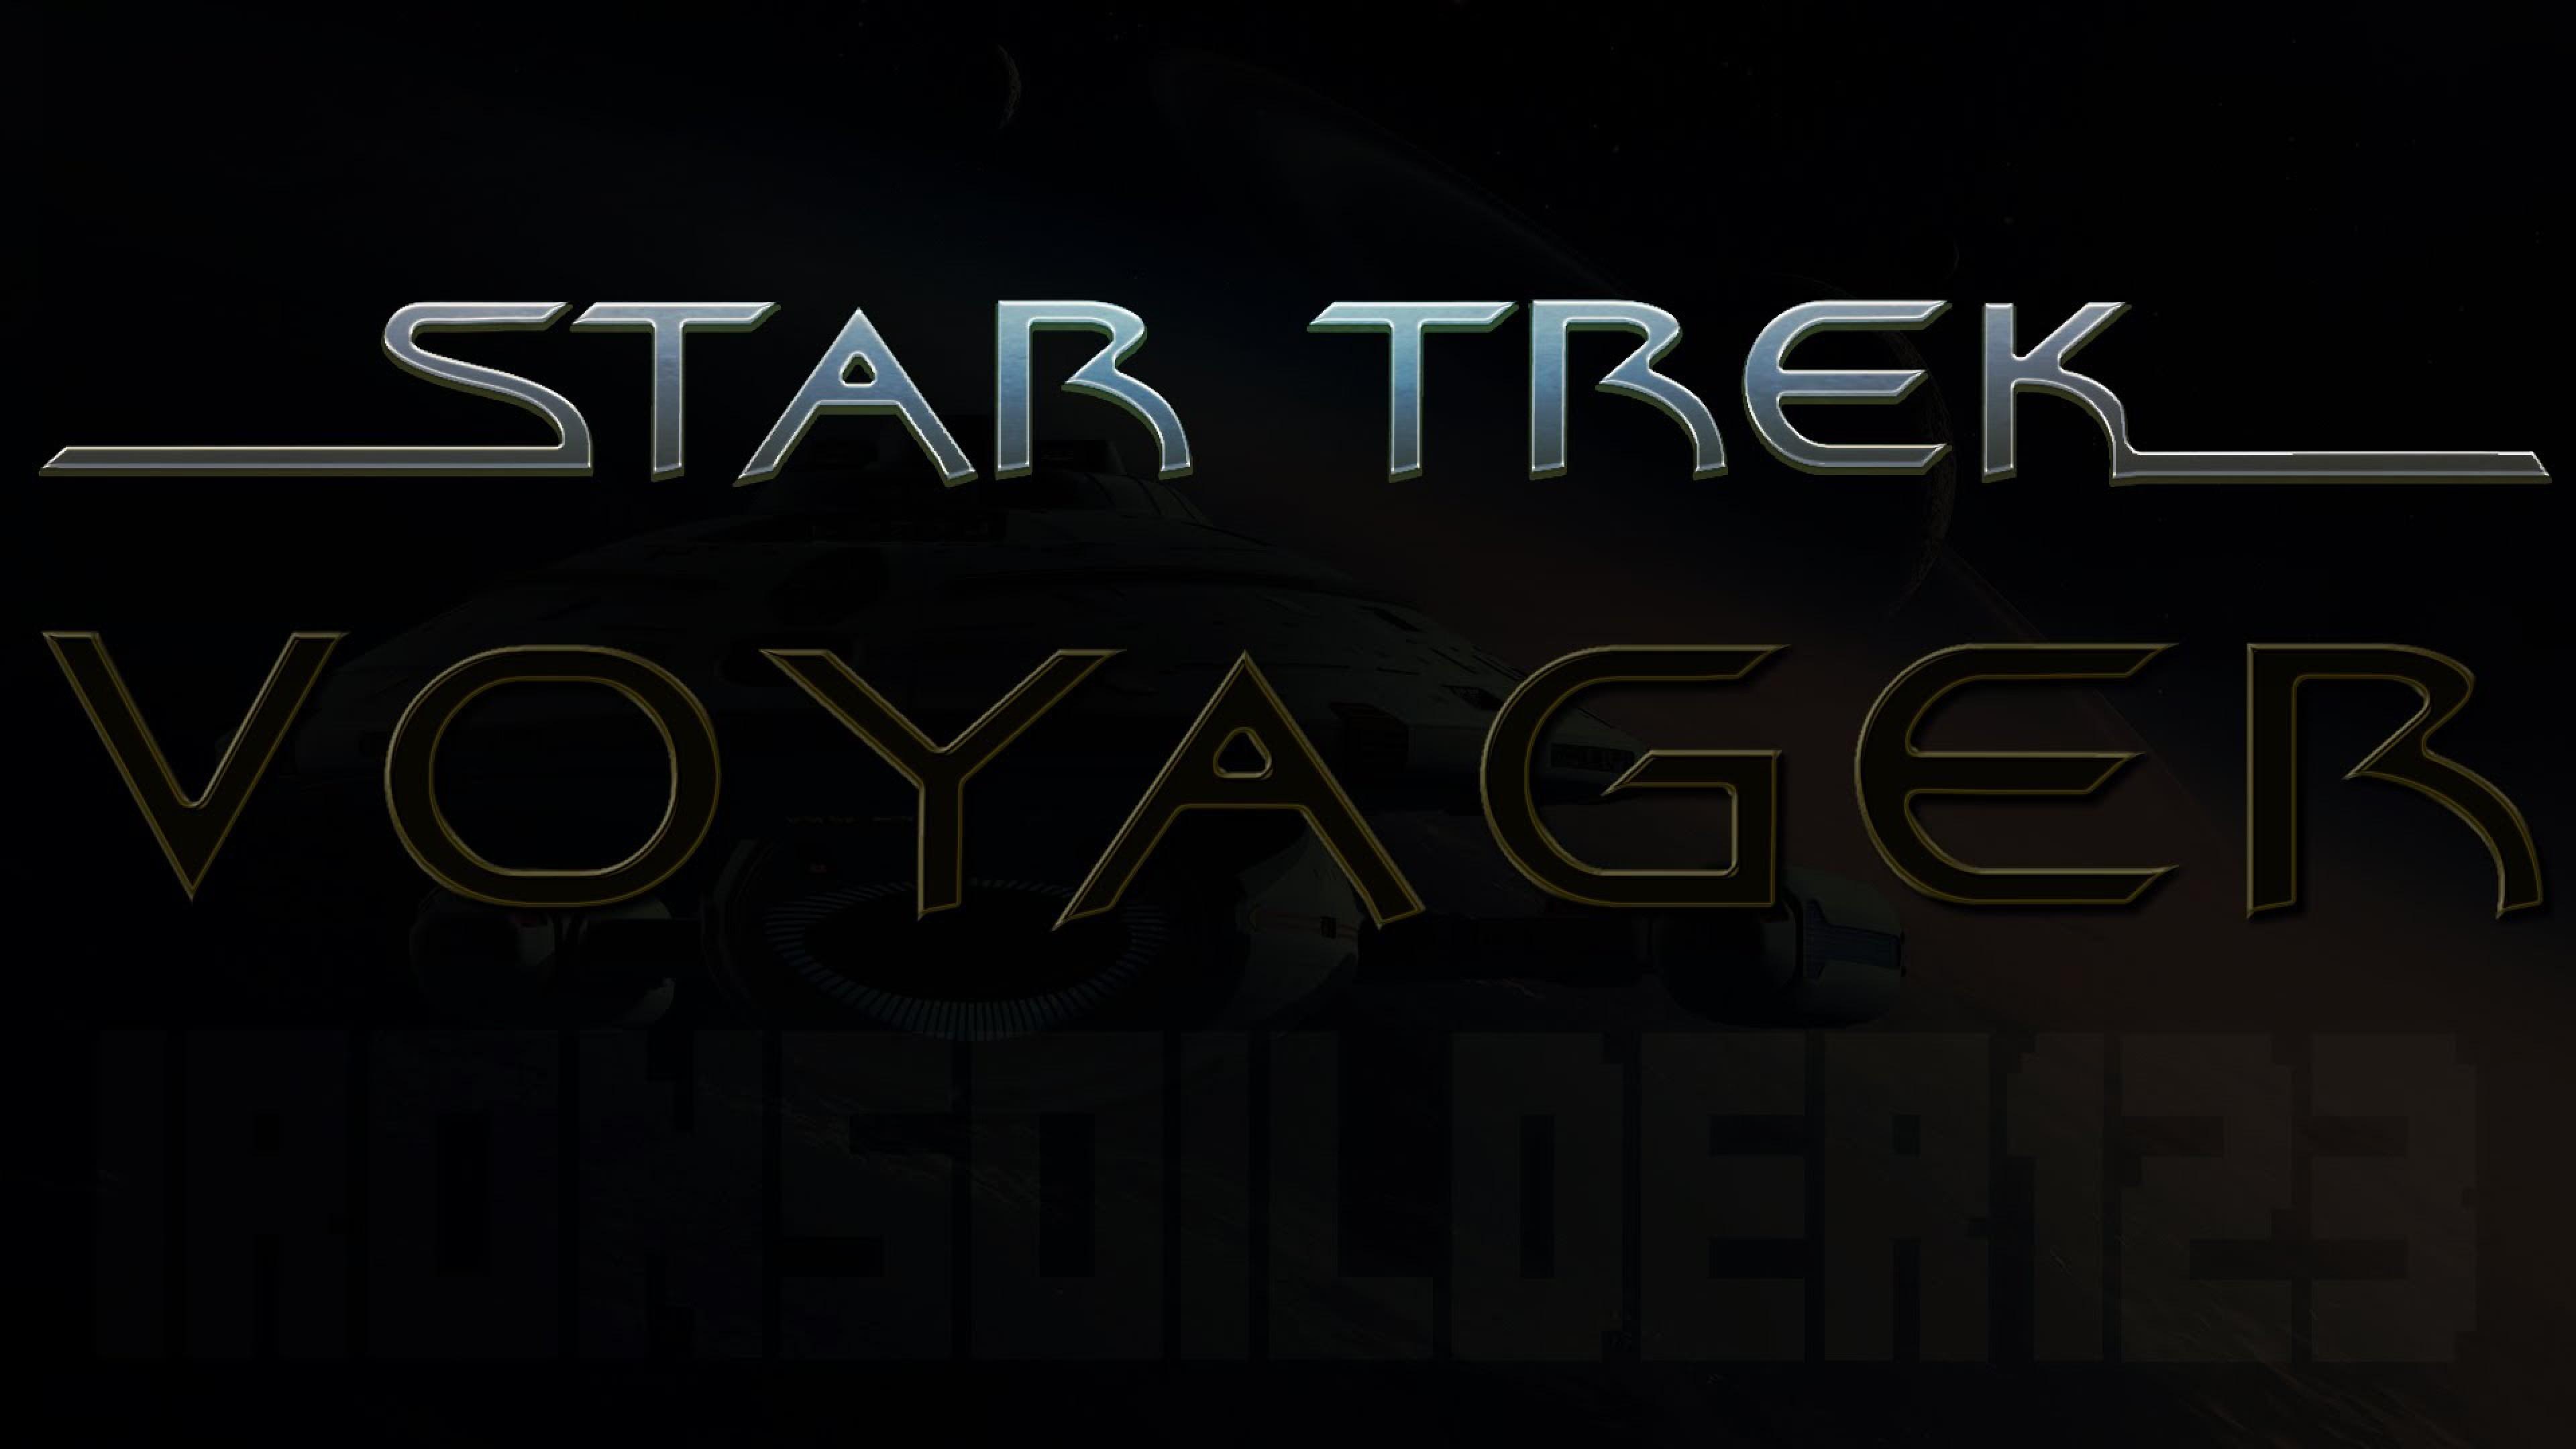 1920x1200 Star Trek Wallpapers